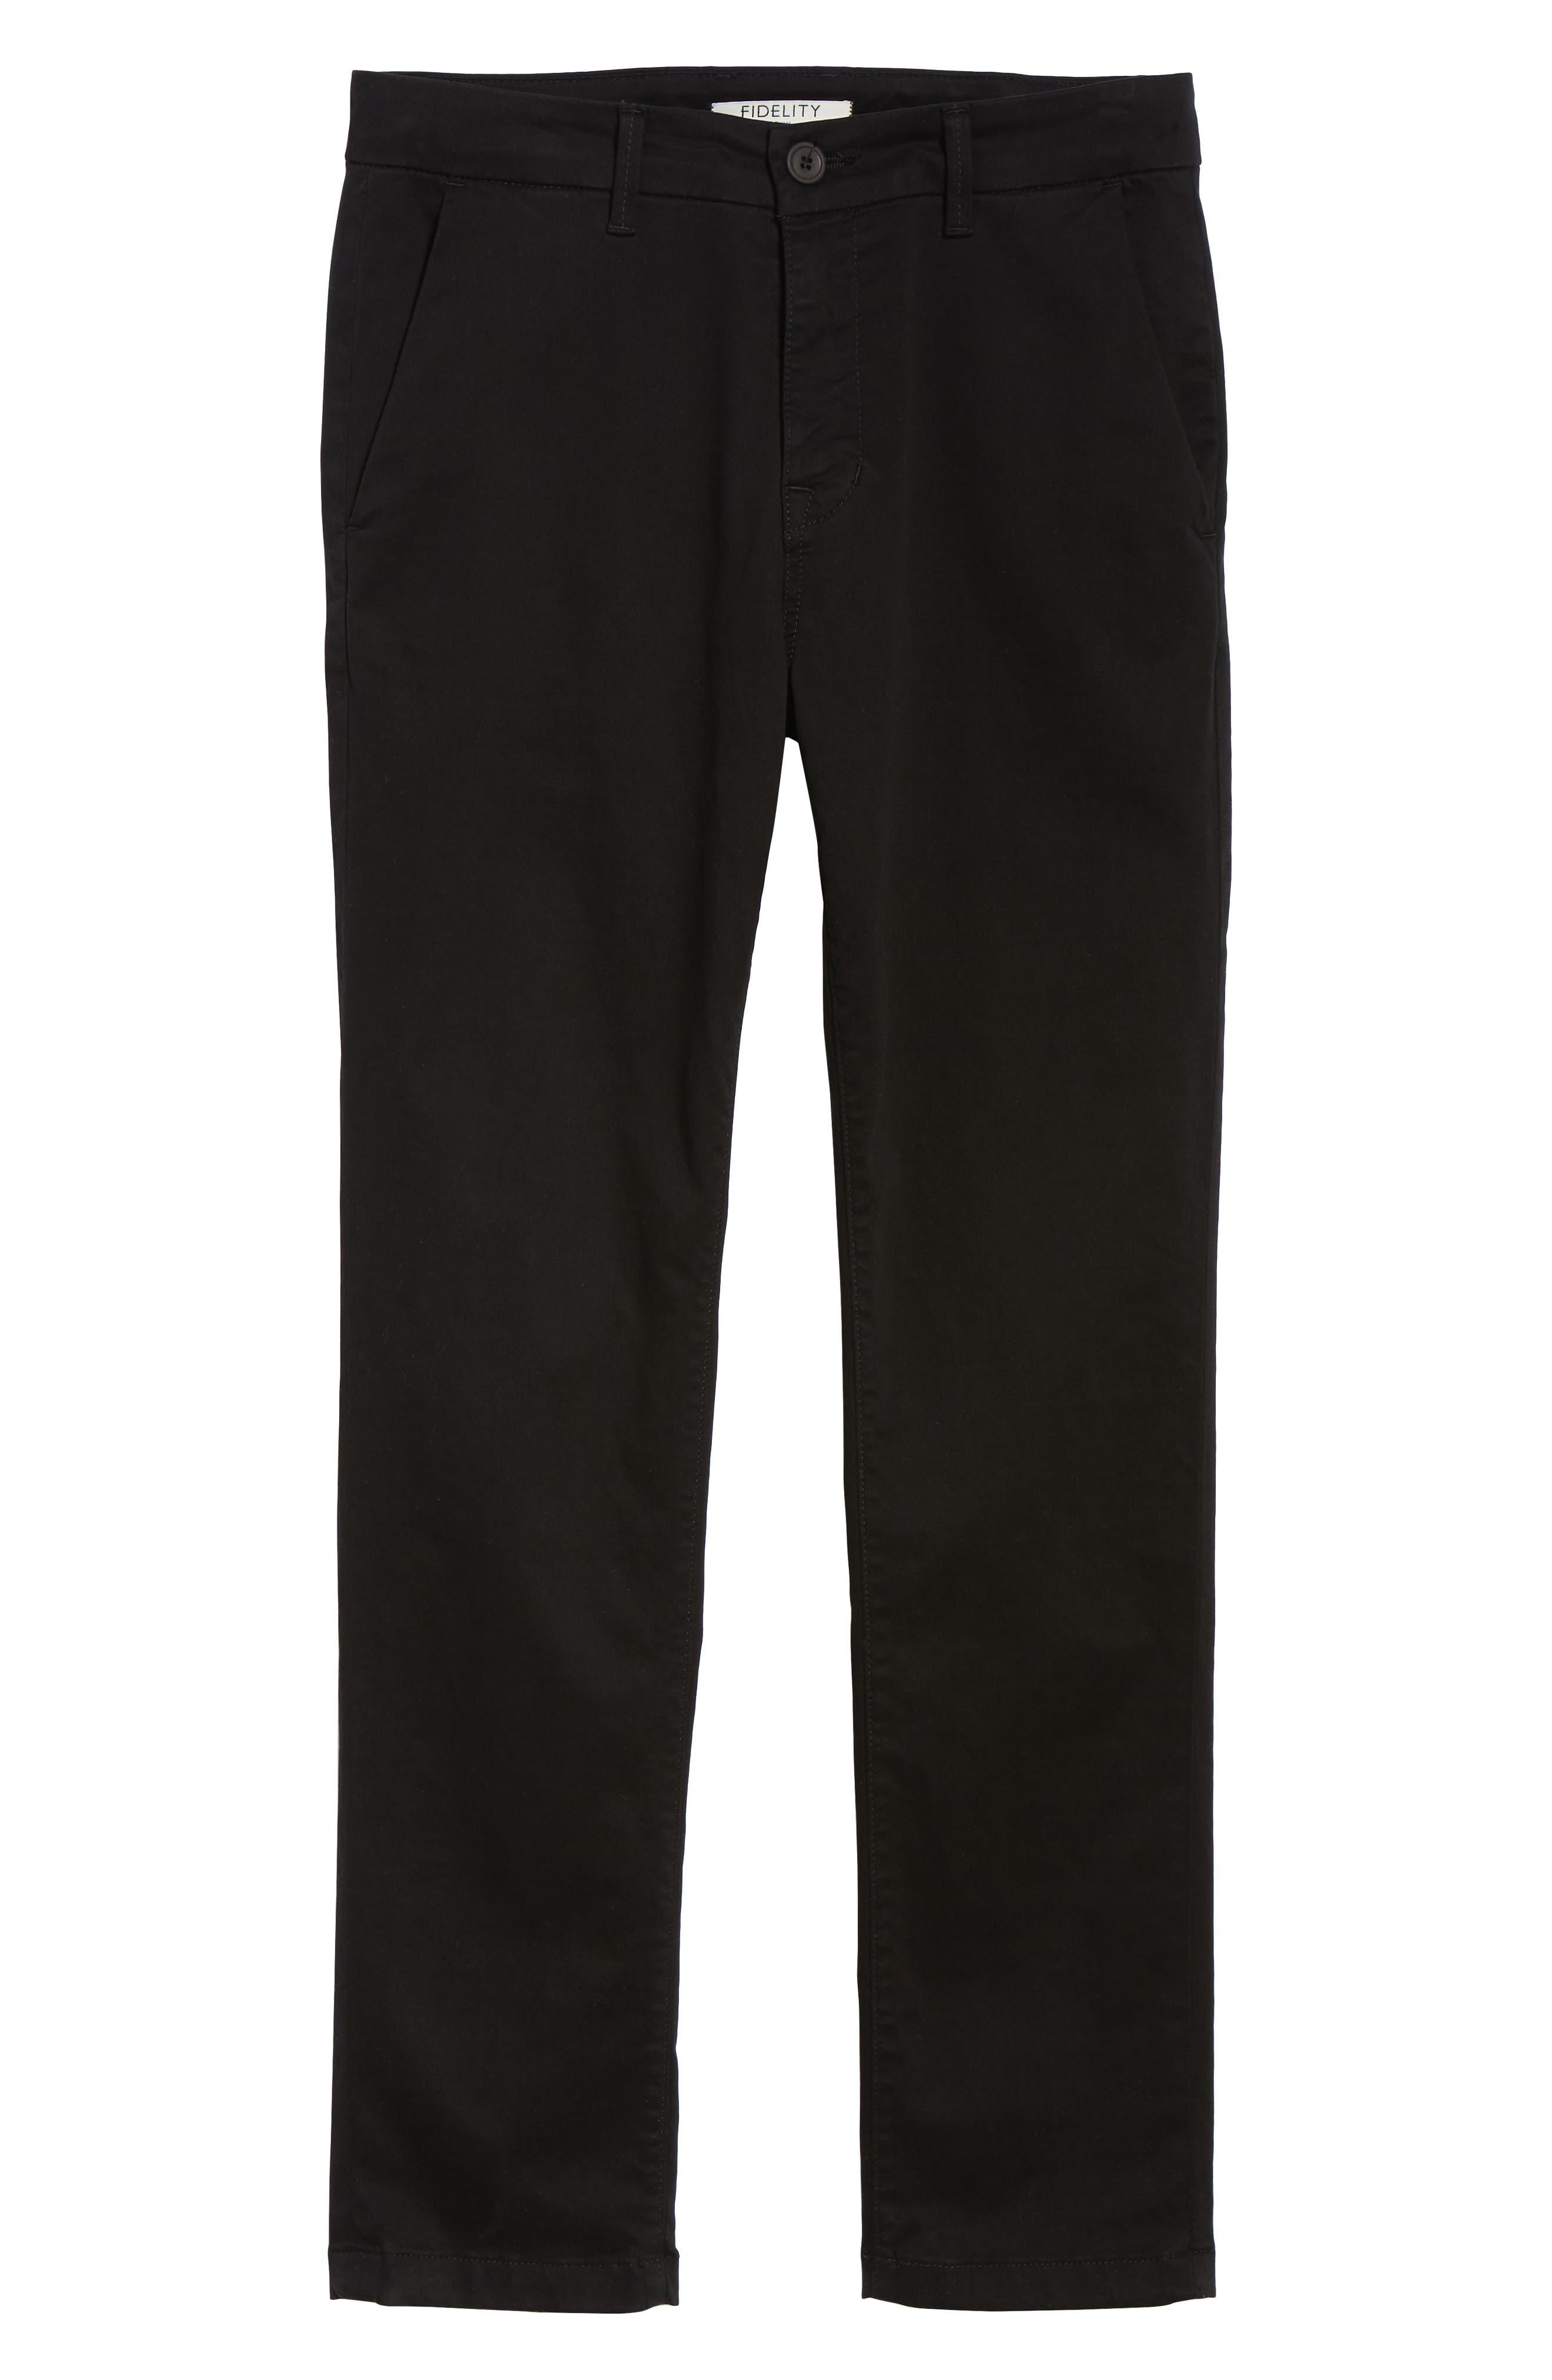 FIDELITY DENIM,                             Weekend Slim Fit Chino Pants,                             Alternate thumbnail 6, color,                             001